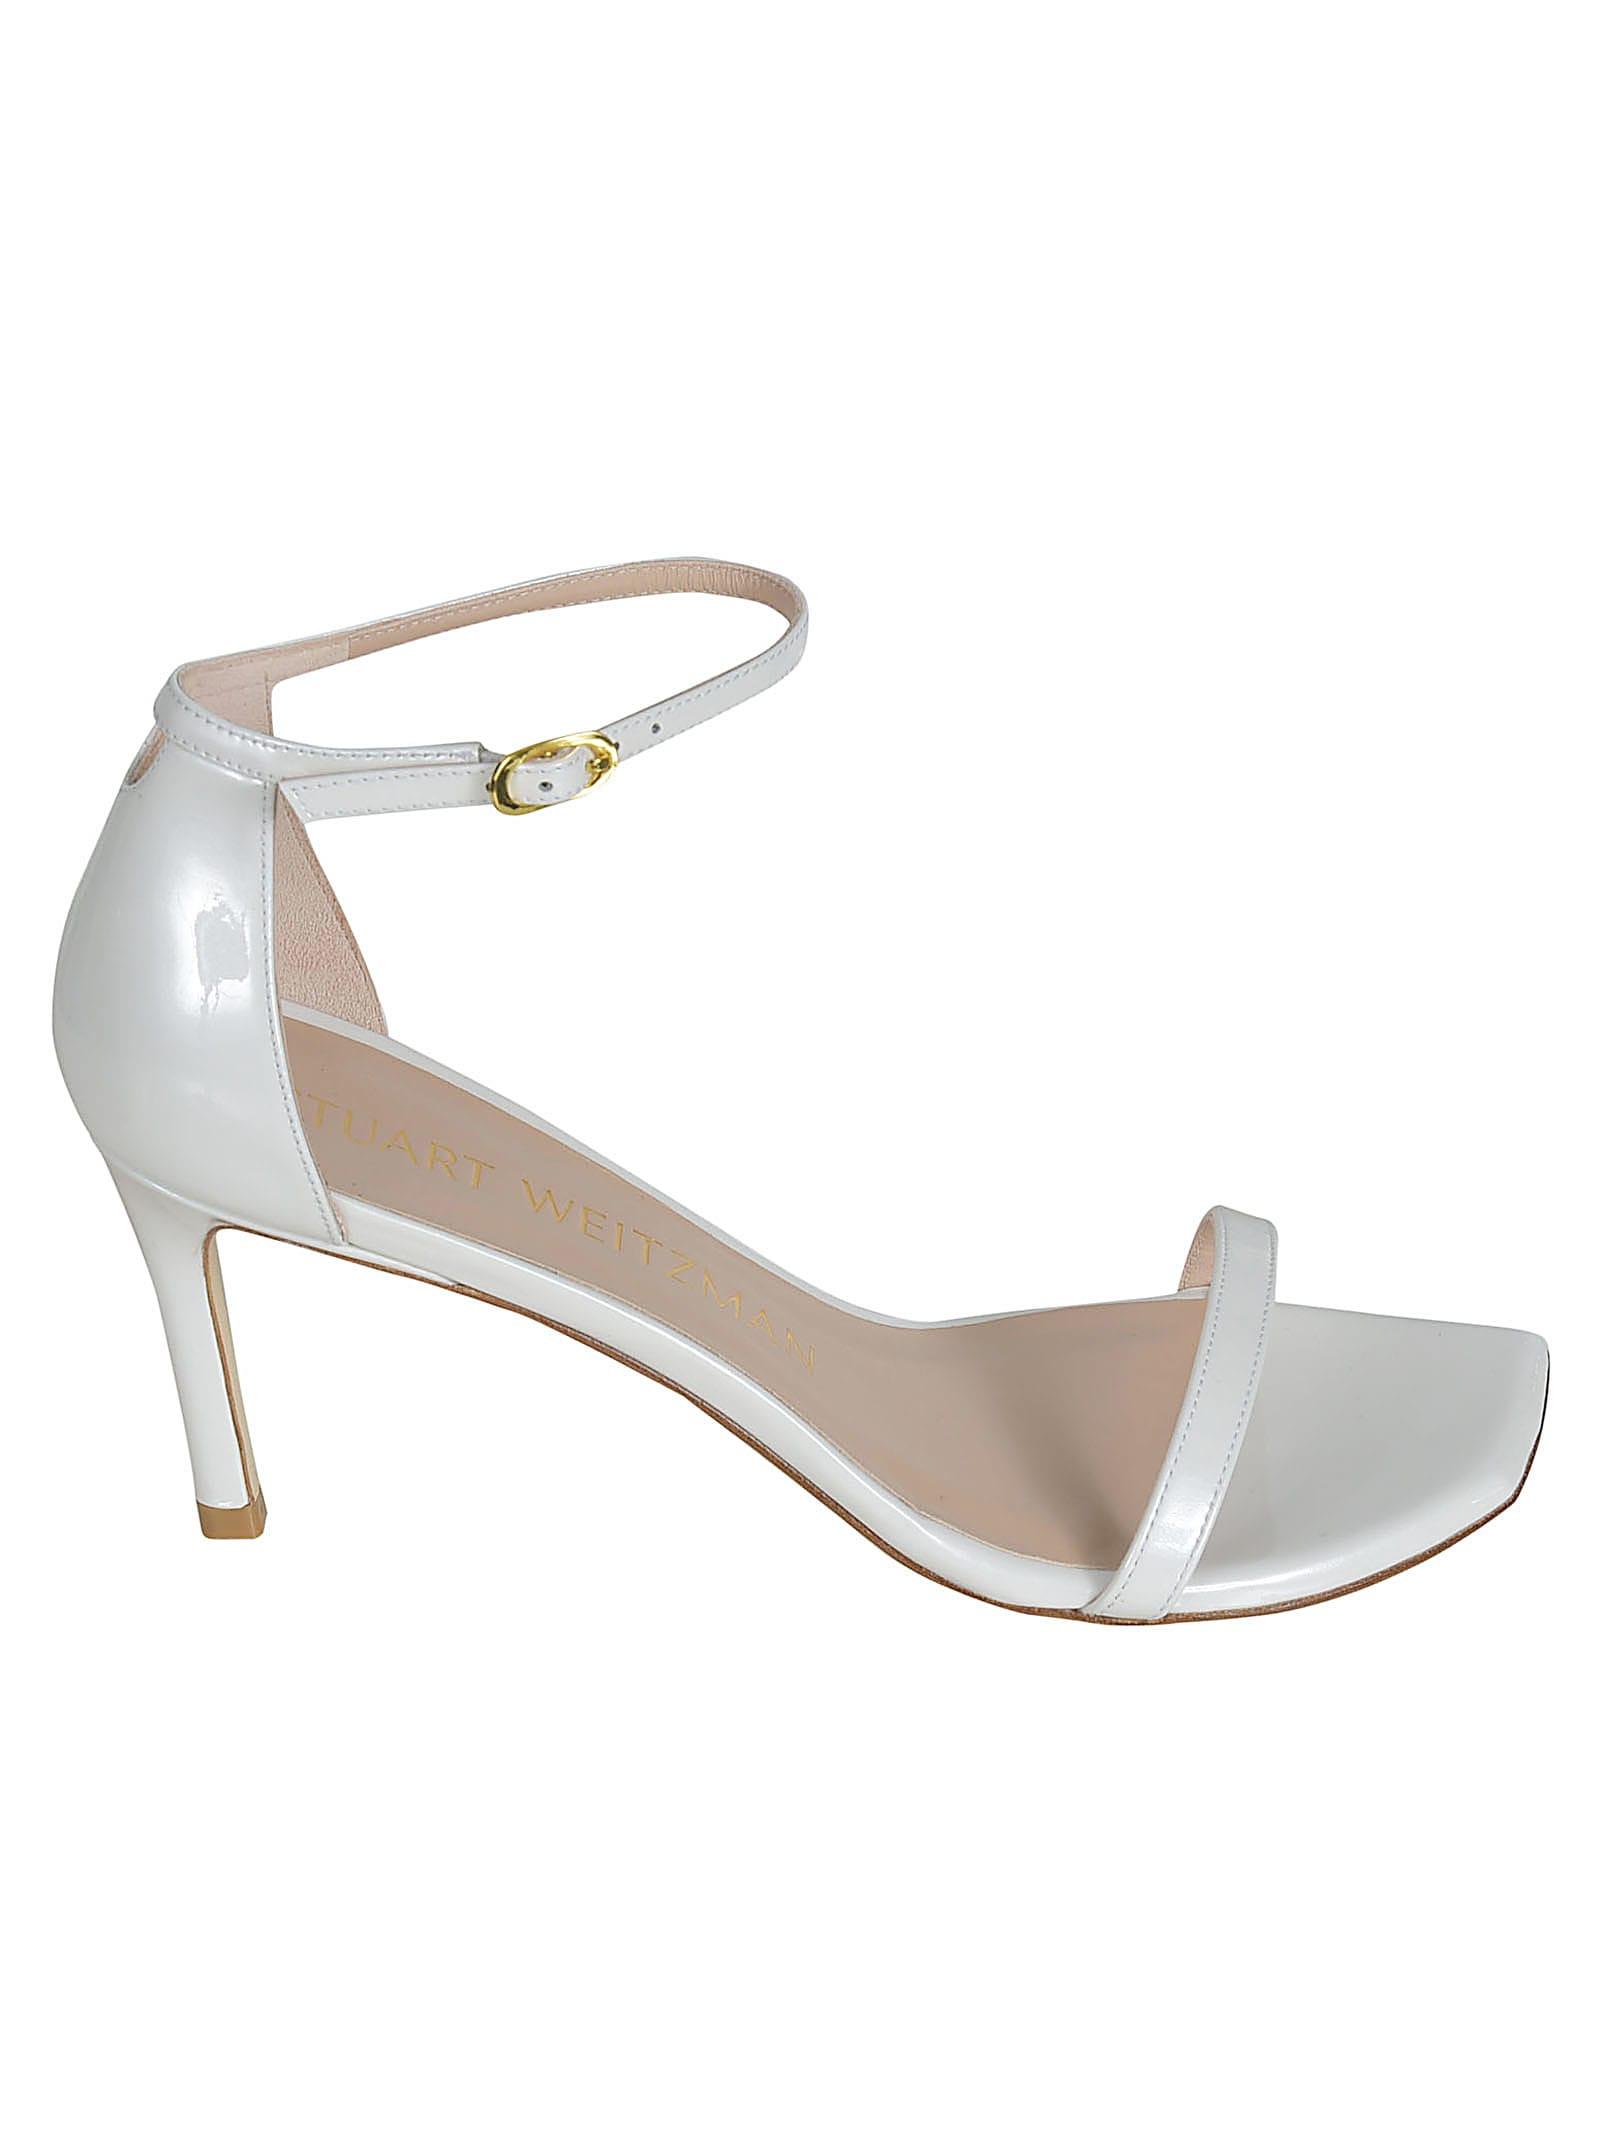 Buy Stuart Weitzman Amelina 75 Sandals online, shop Stuart Weitzman shoes with free shipping